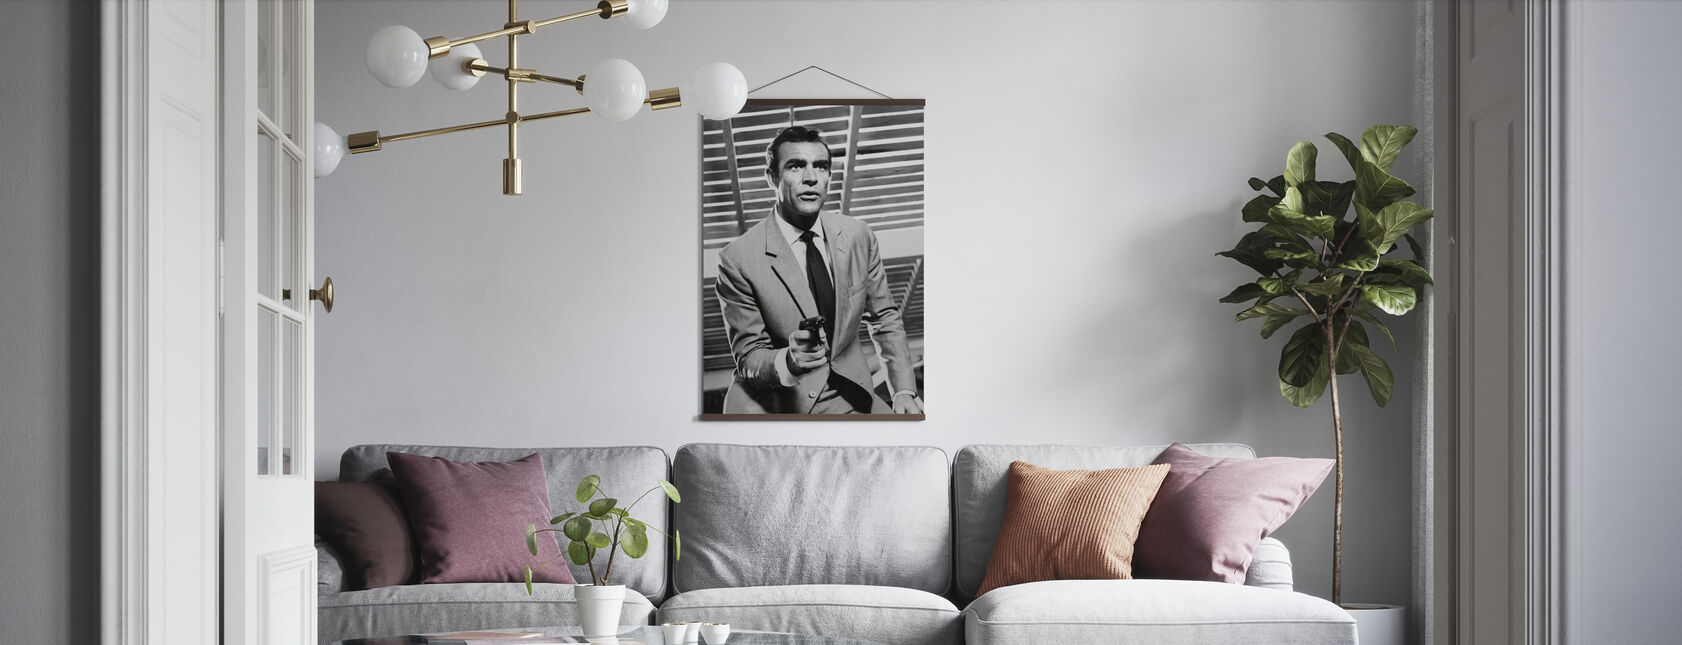 James Bond - Sean Connery - Affiche - Salle à manger